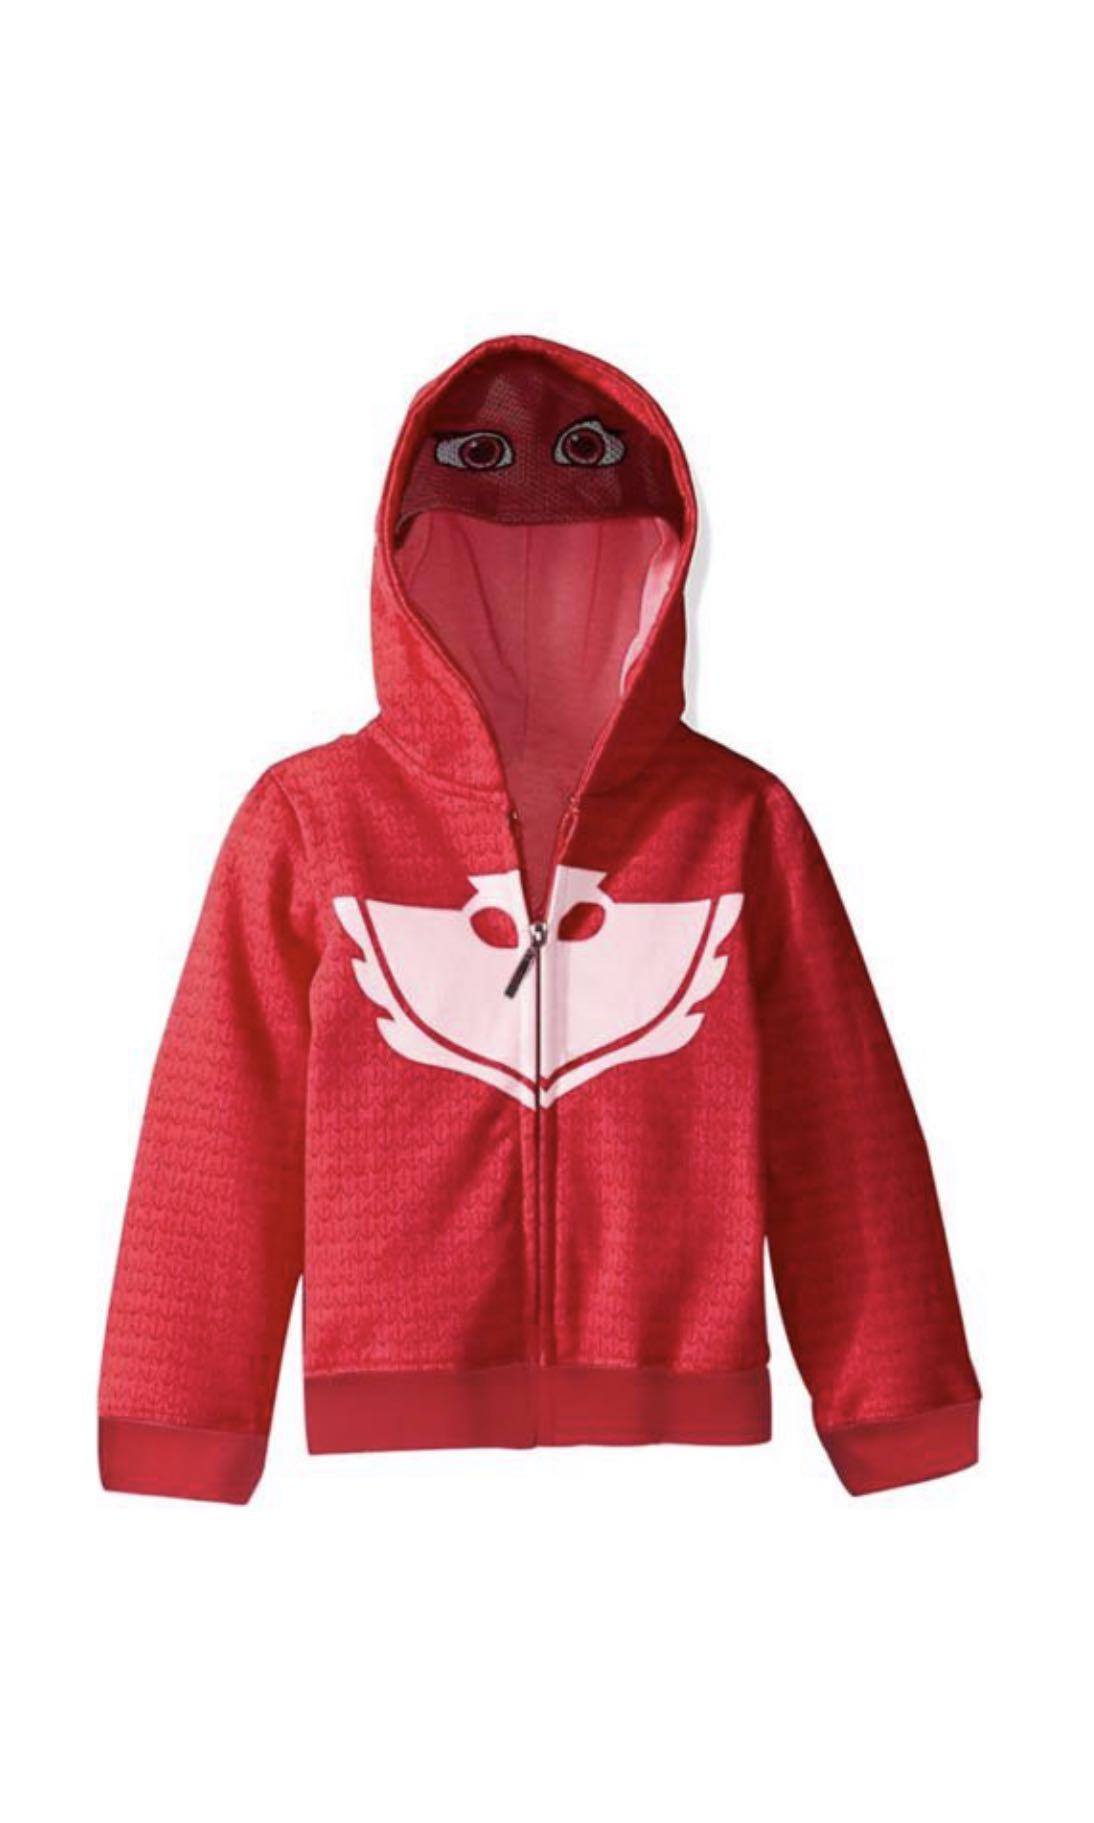 Instock pj mask owlette jackets brand new size 100-130cm